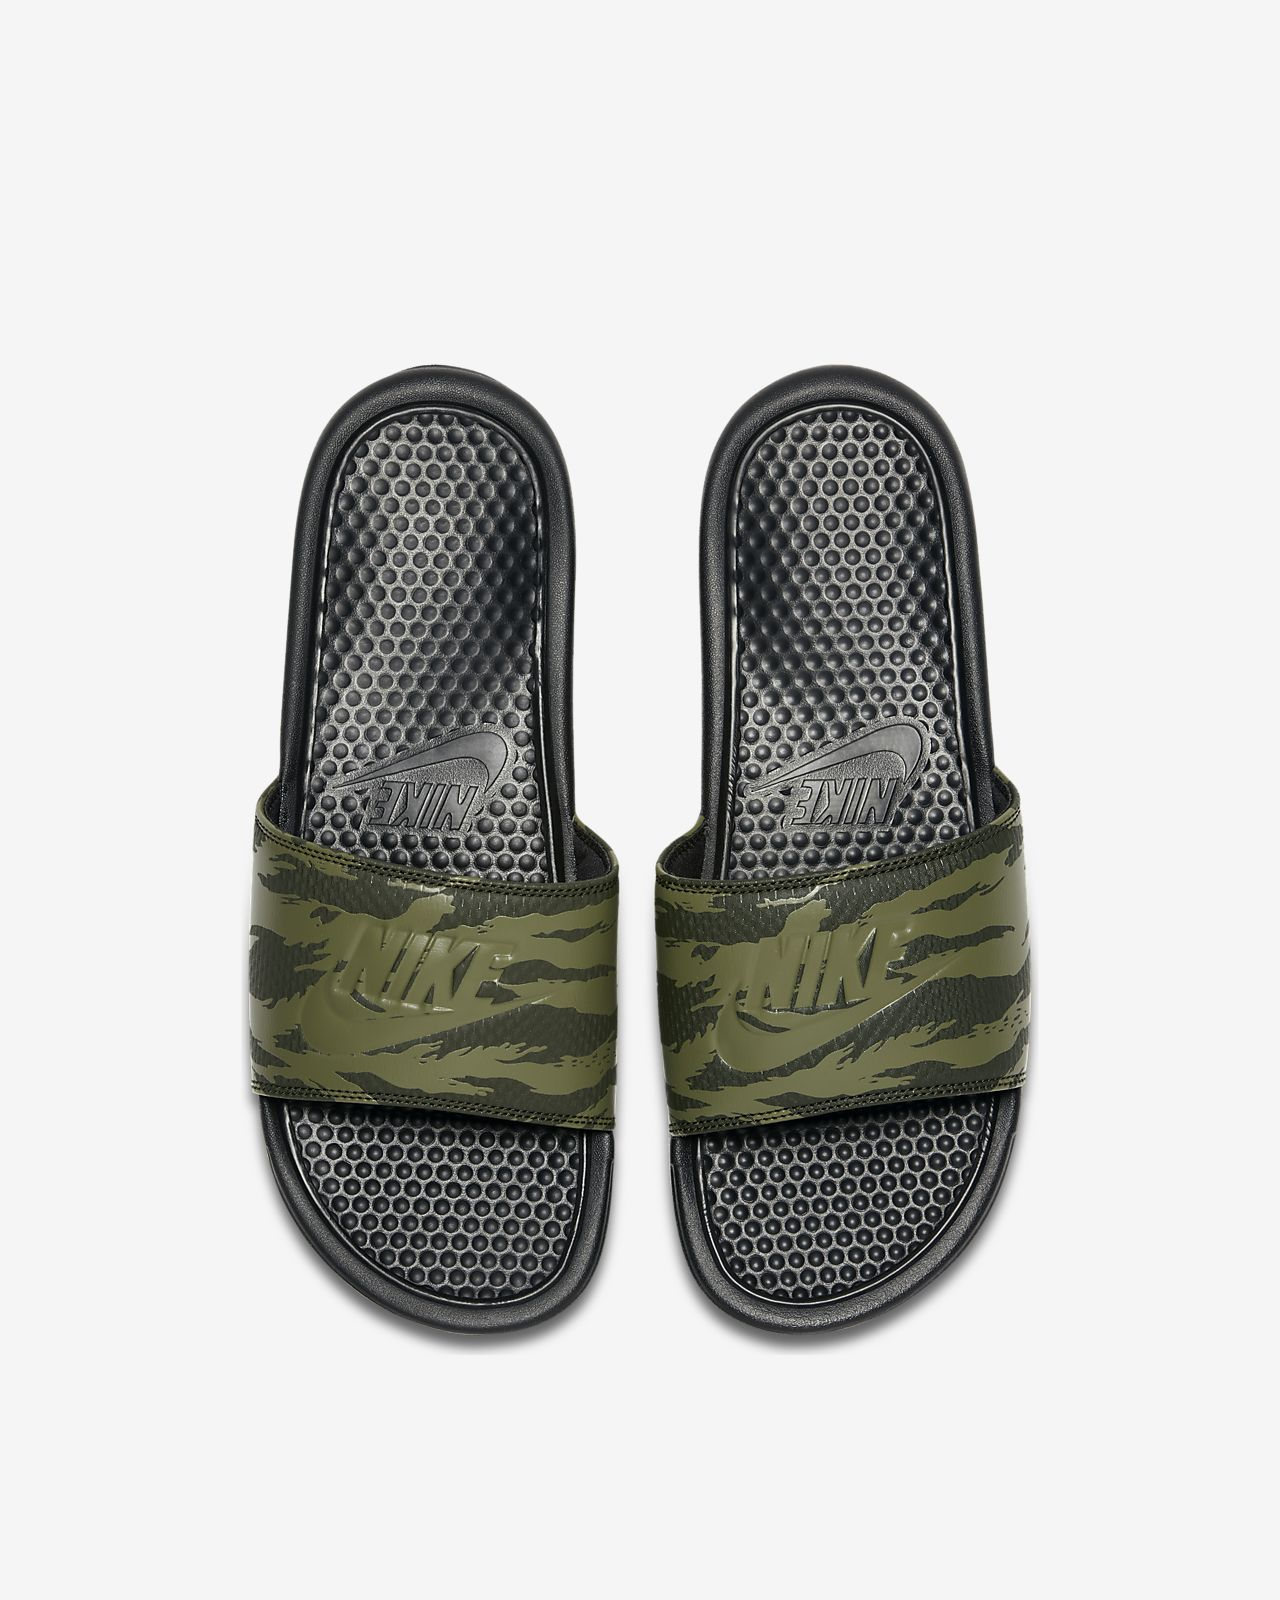 new styles 4364c fe2f0 ... Nike Benassi JDI Chanclas - Hombre